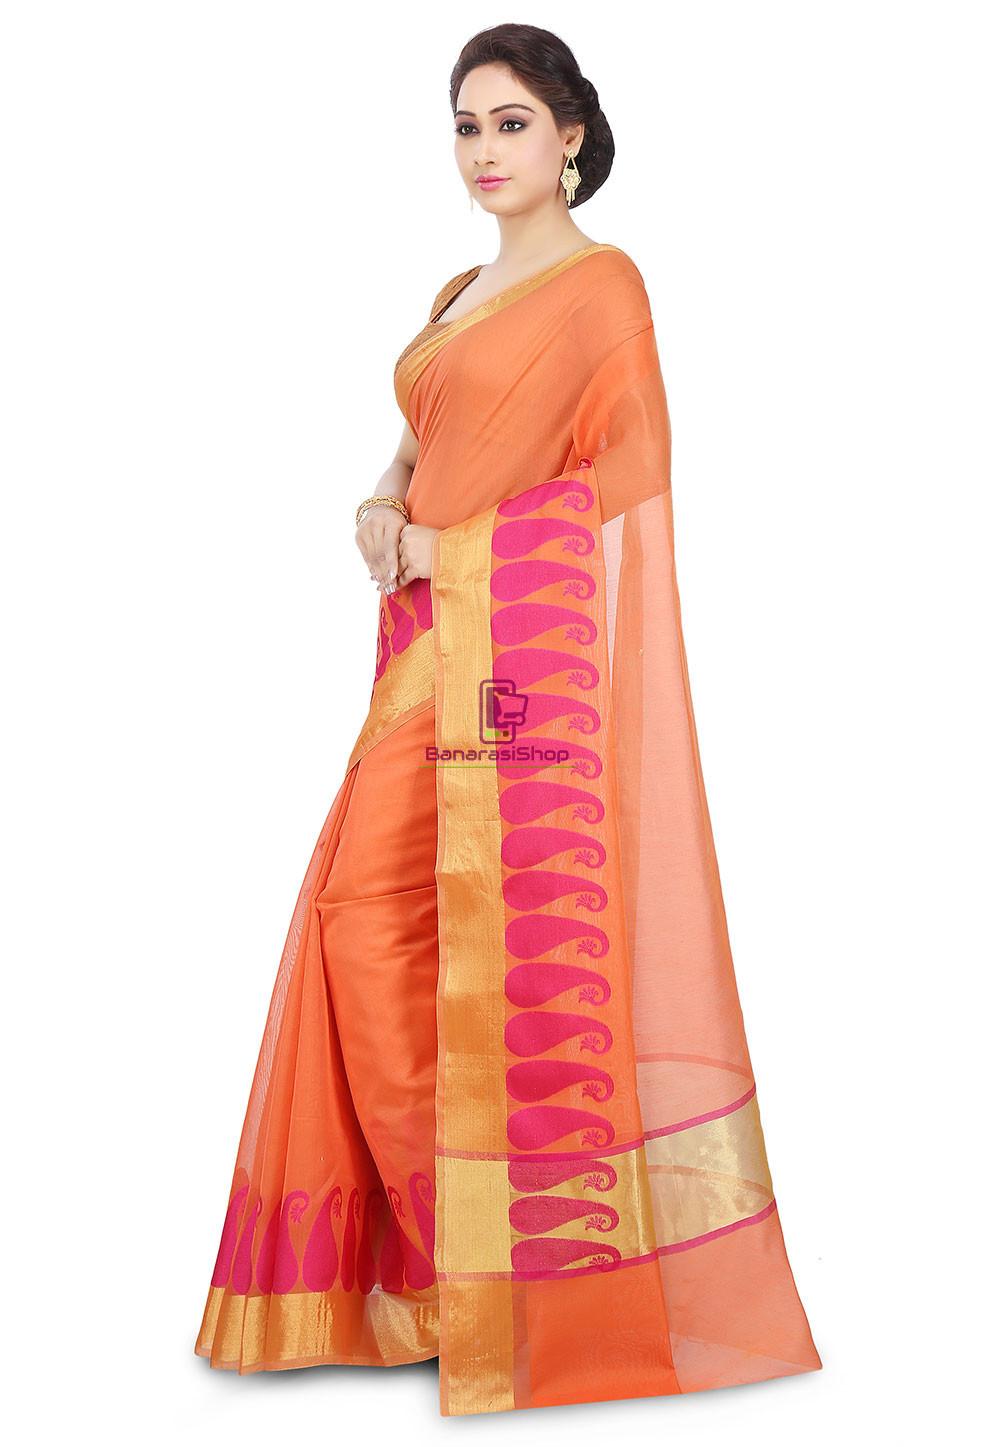 Woven Banarasi Chanderi Cotton Saree in Orange 5